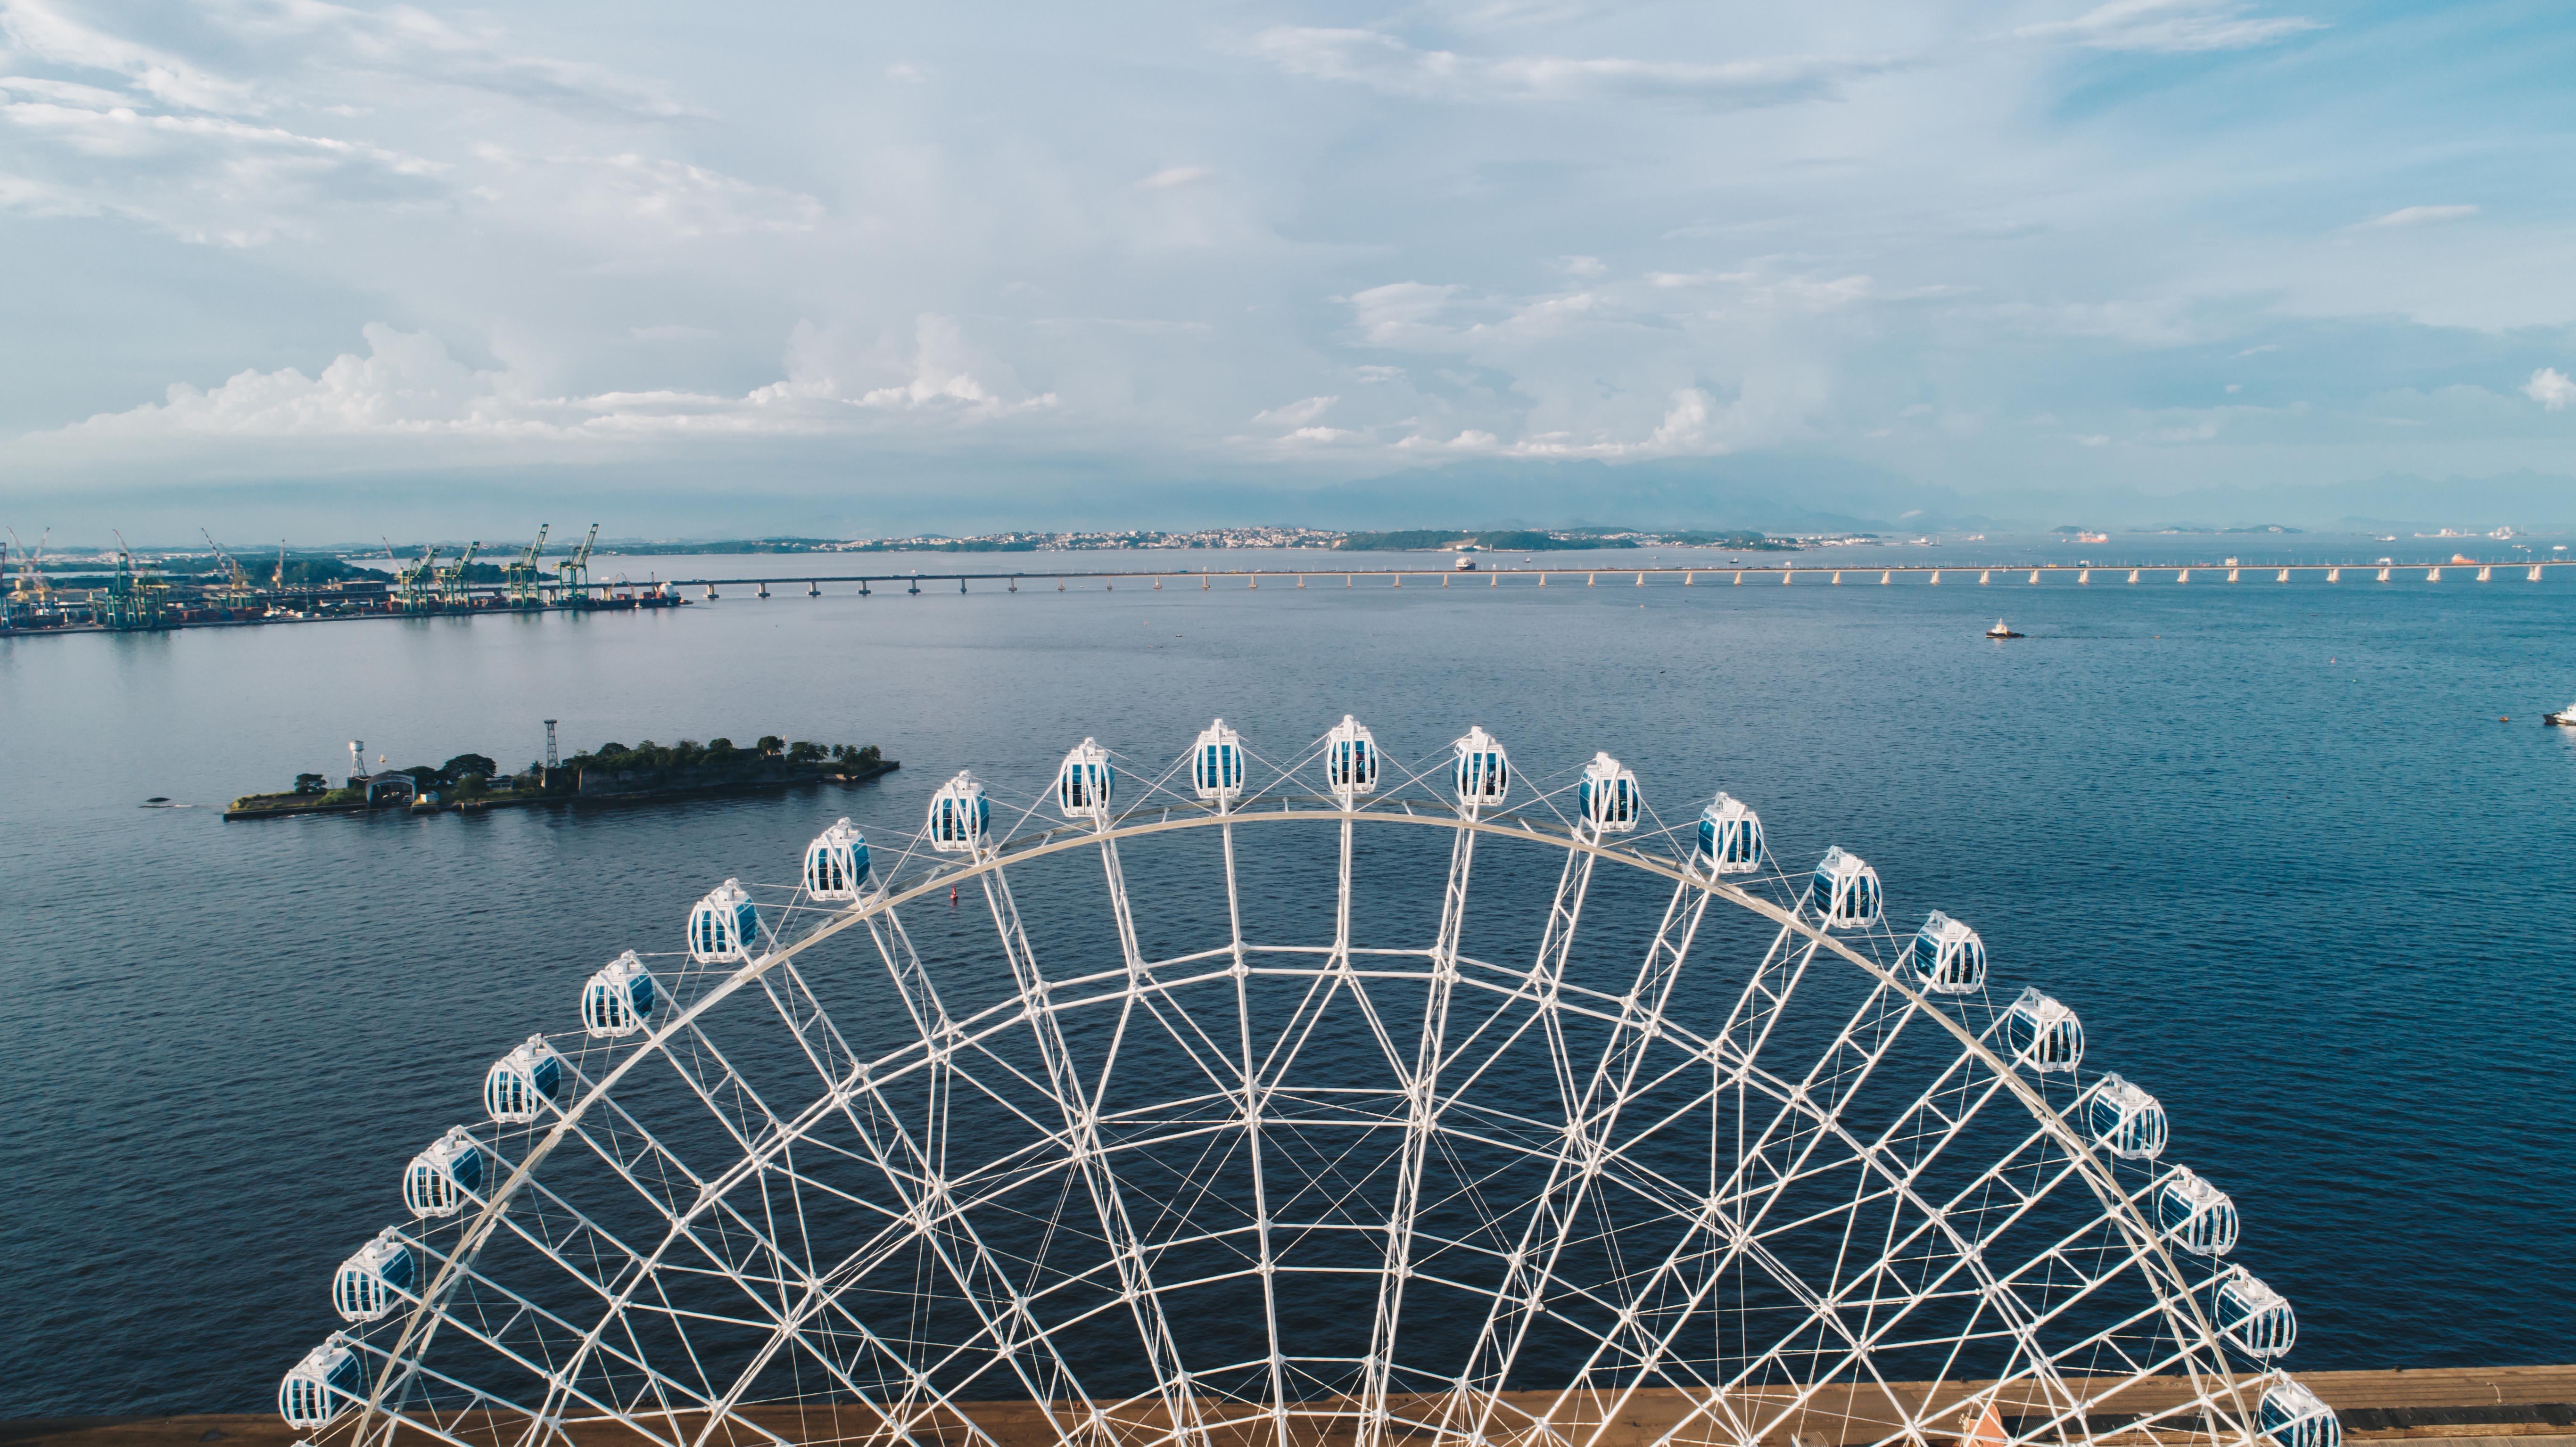 Parte de cima da roda gigante com a baía de guanabara ao fundo